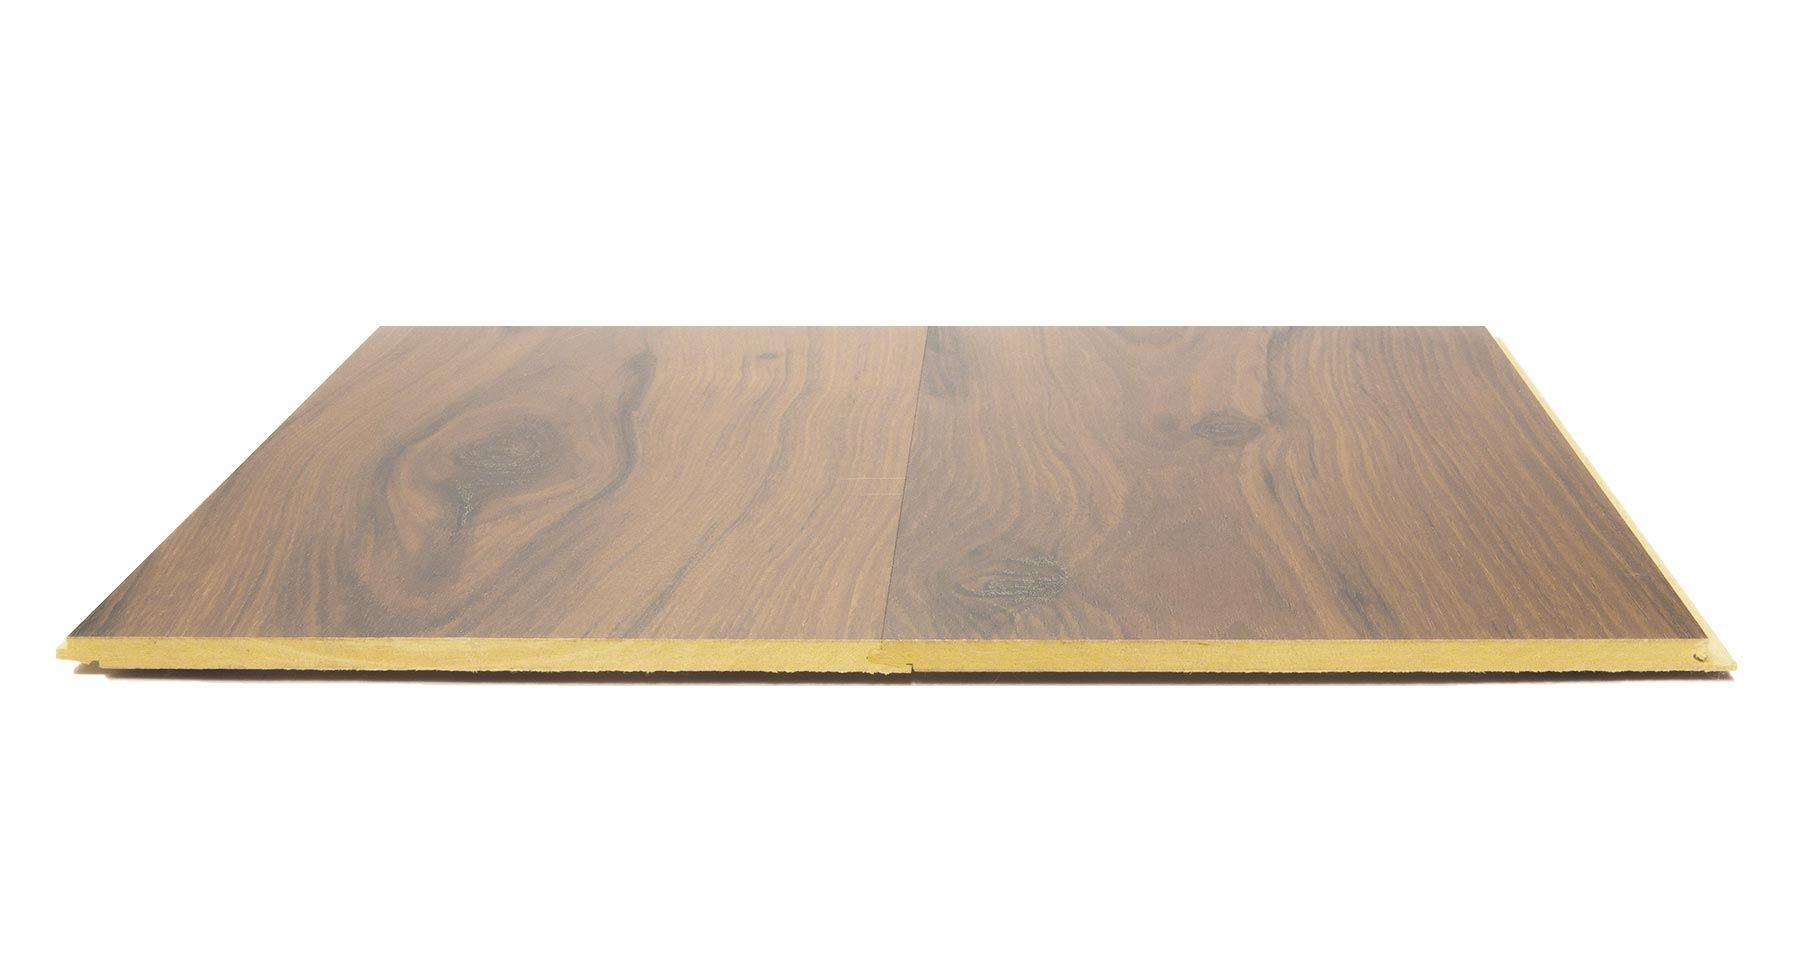 Homestead Ground Nutmeg Hickory Laminate